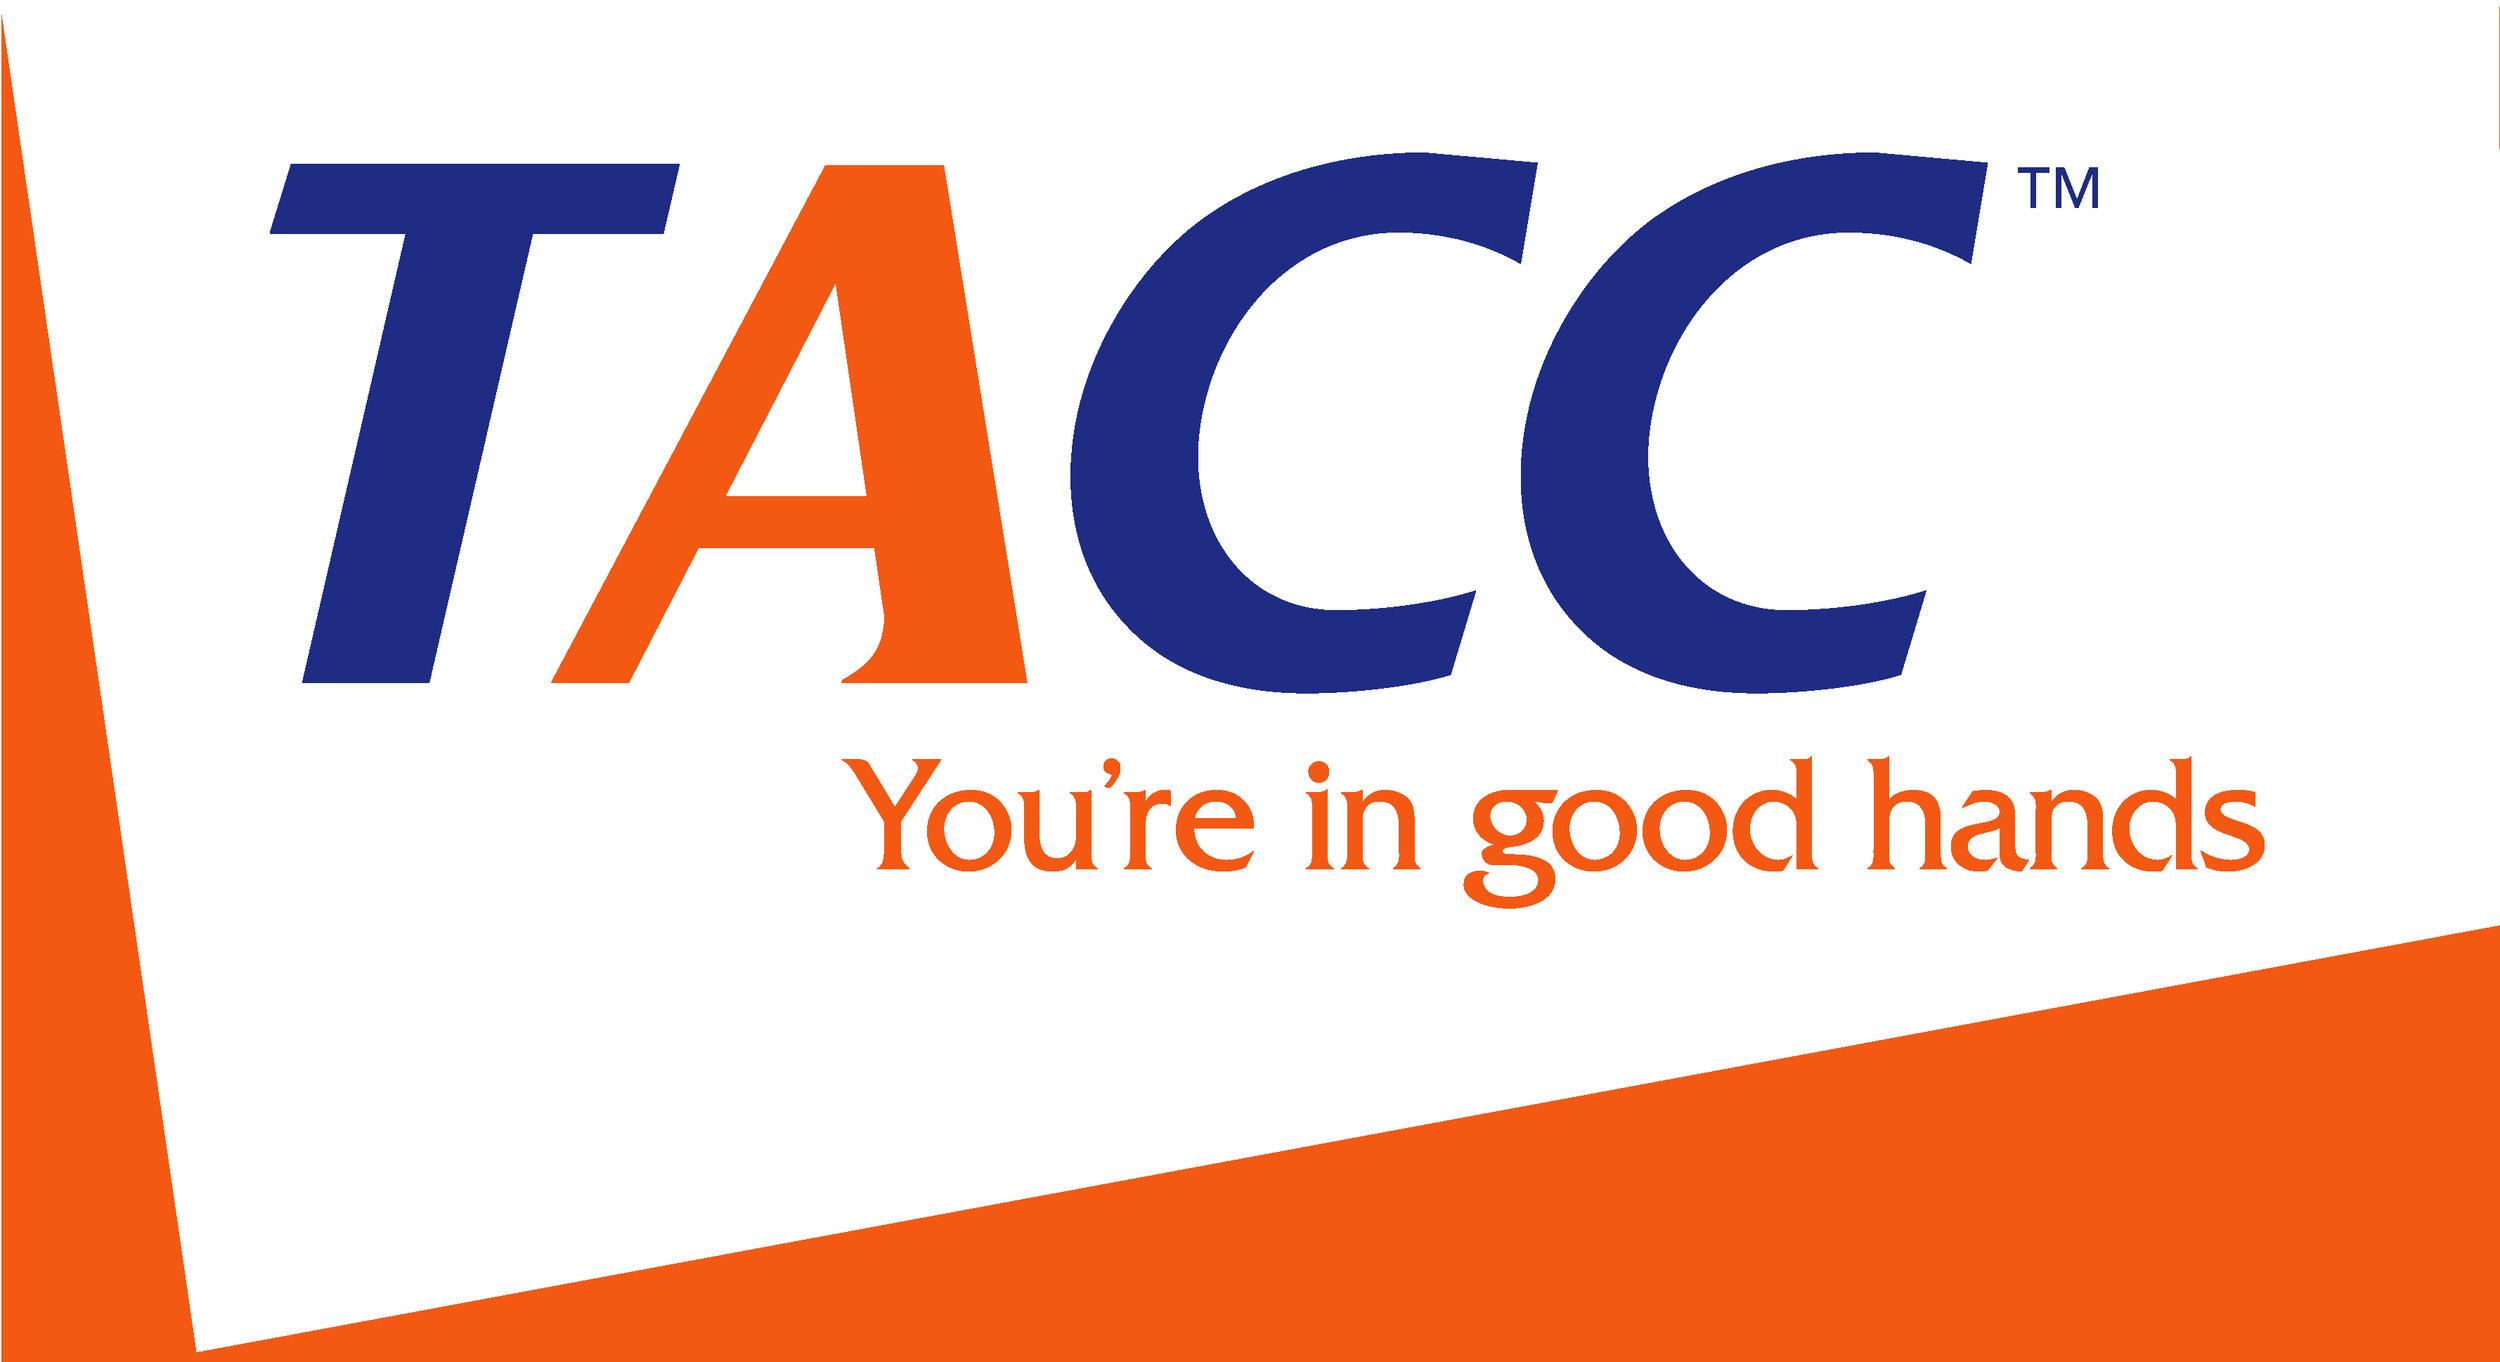 tacc_logo_with_words.jpg